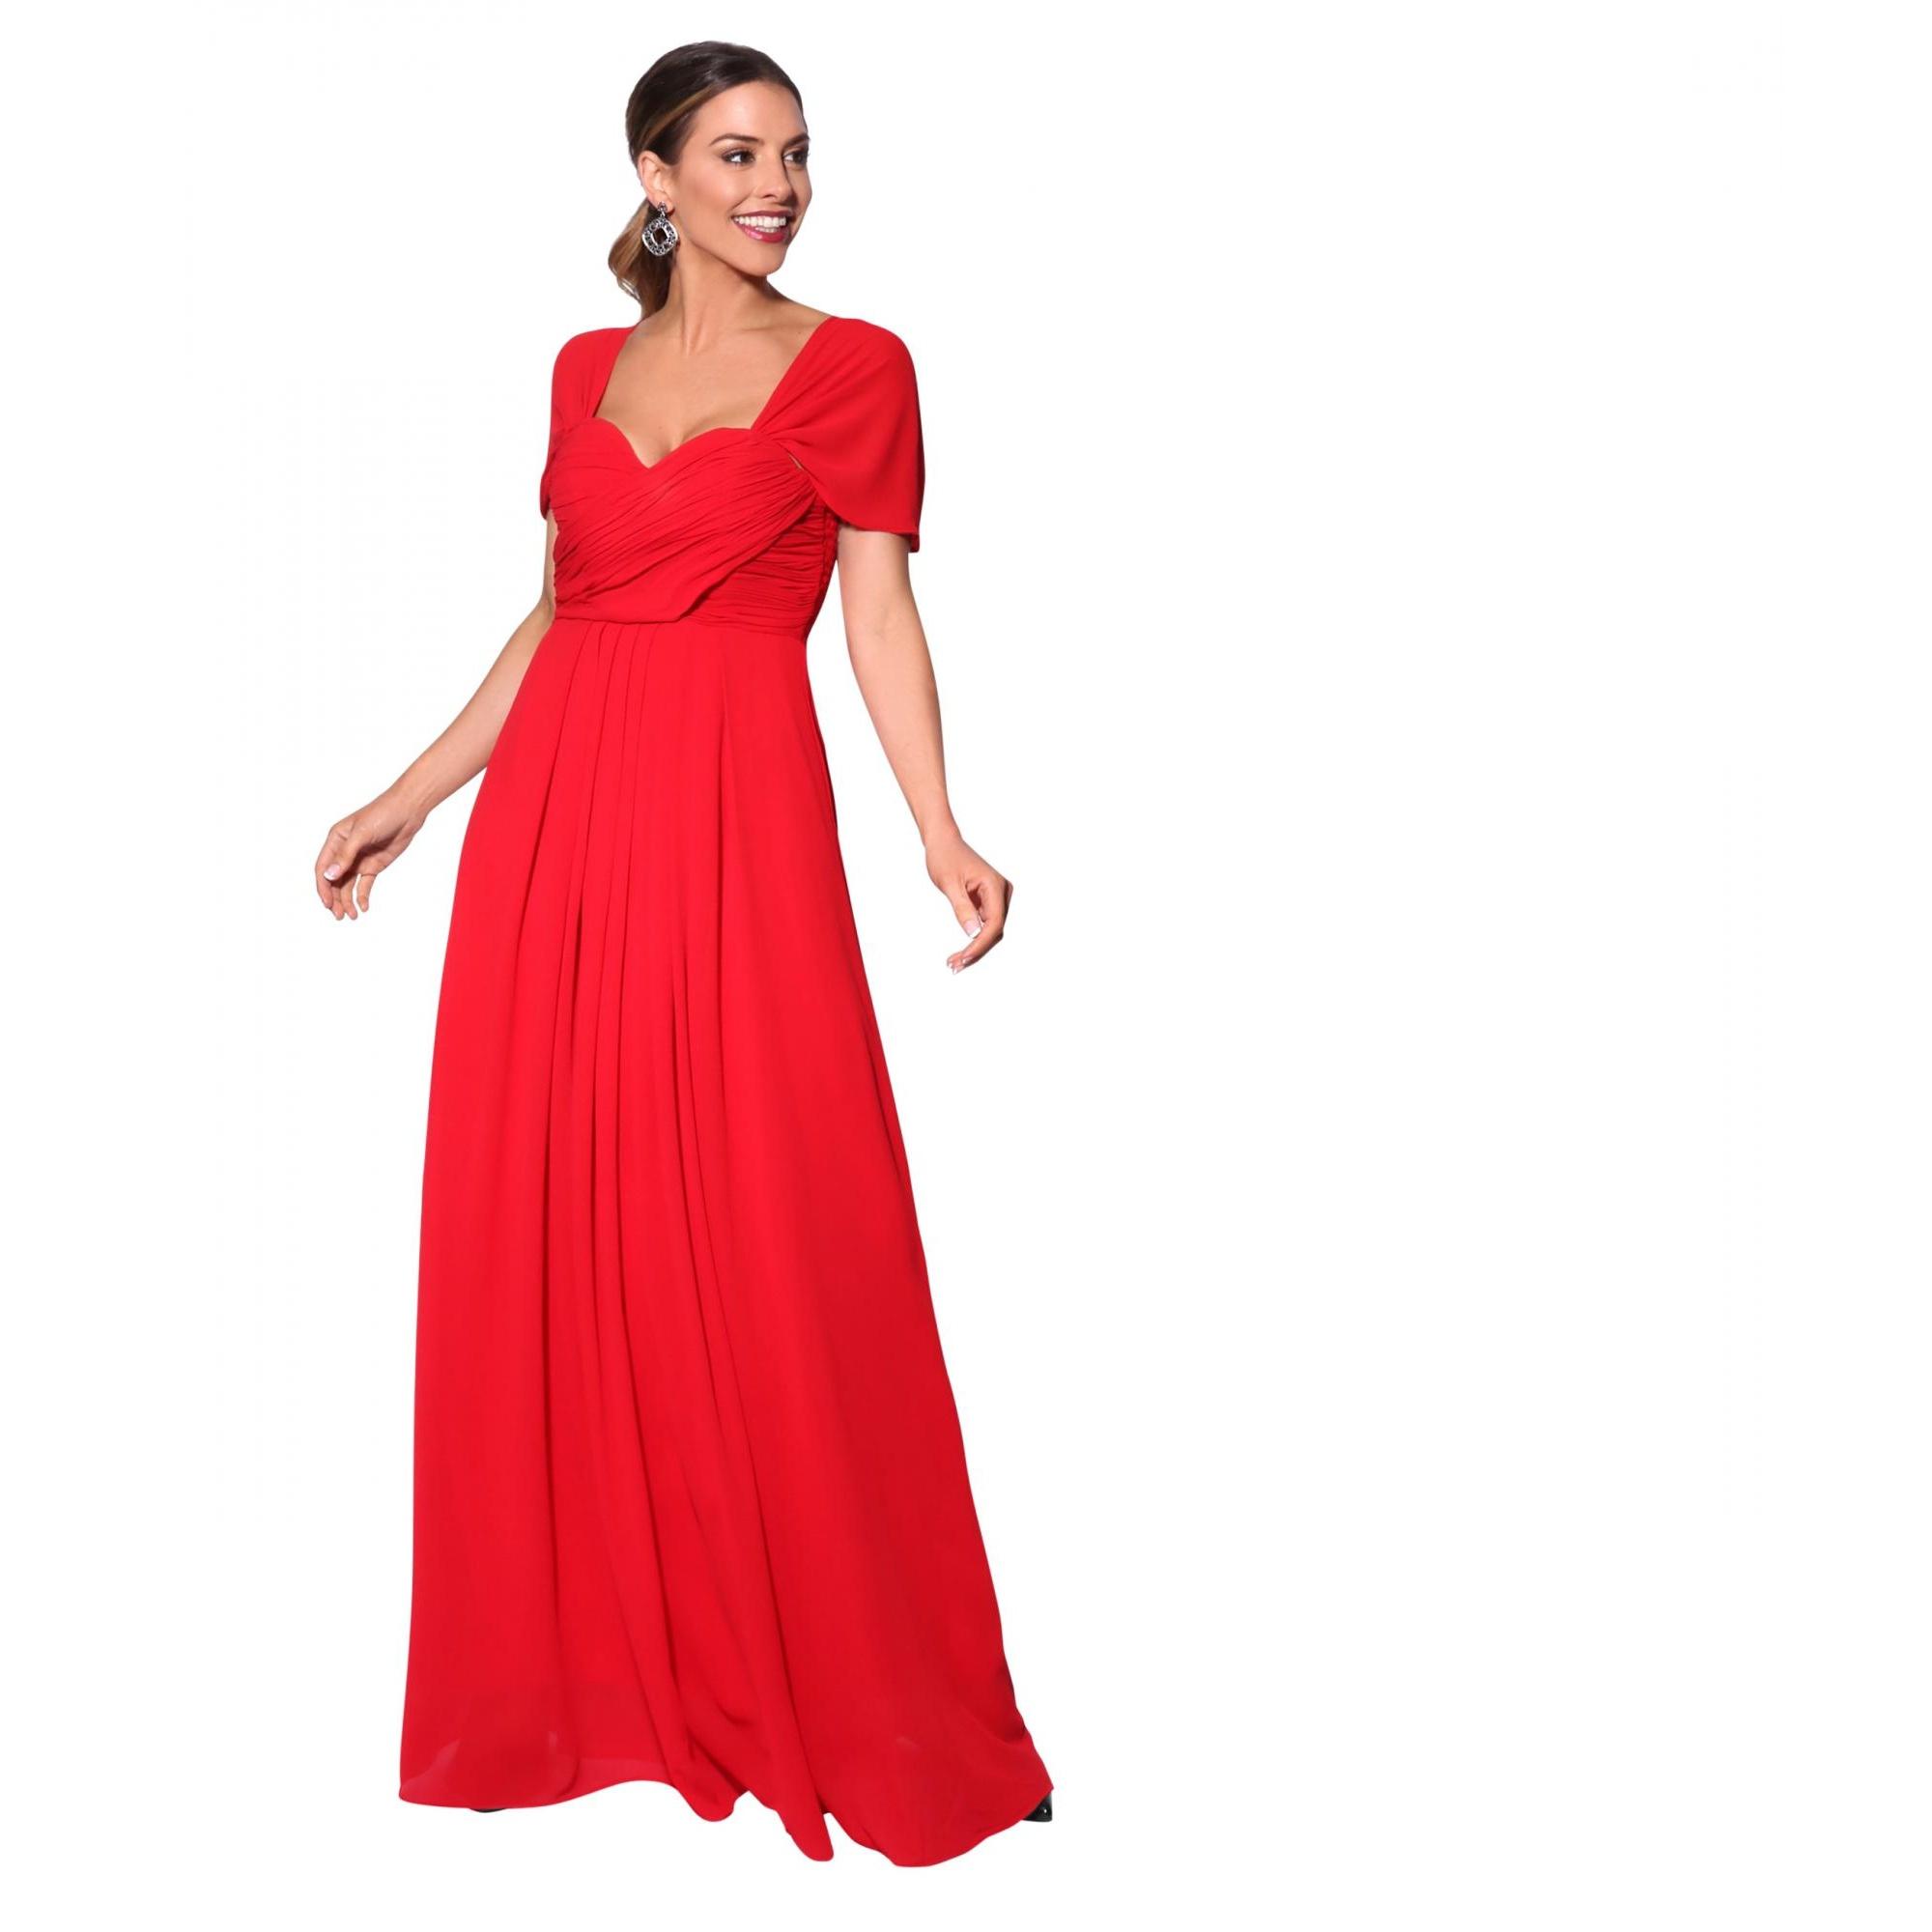 Krisp Womens/Ladies Multiway Neckline Occasion Maxi Dress (10 UK) (Red)